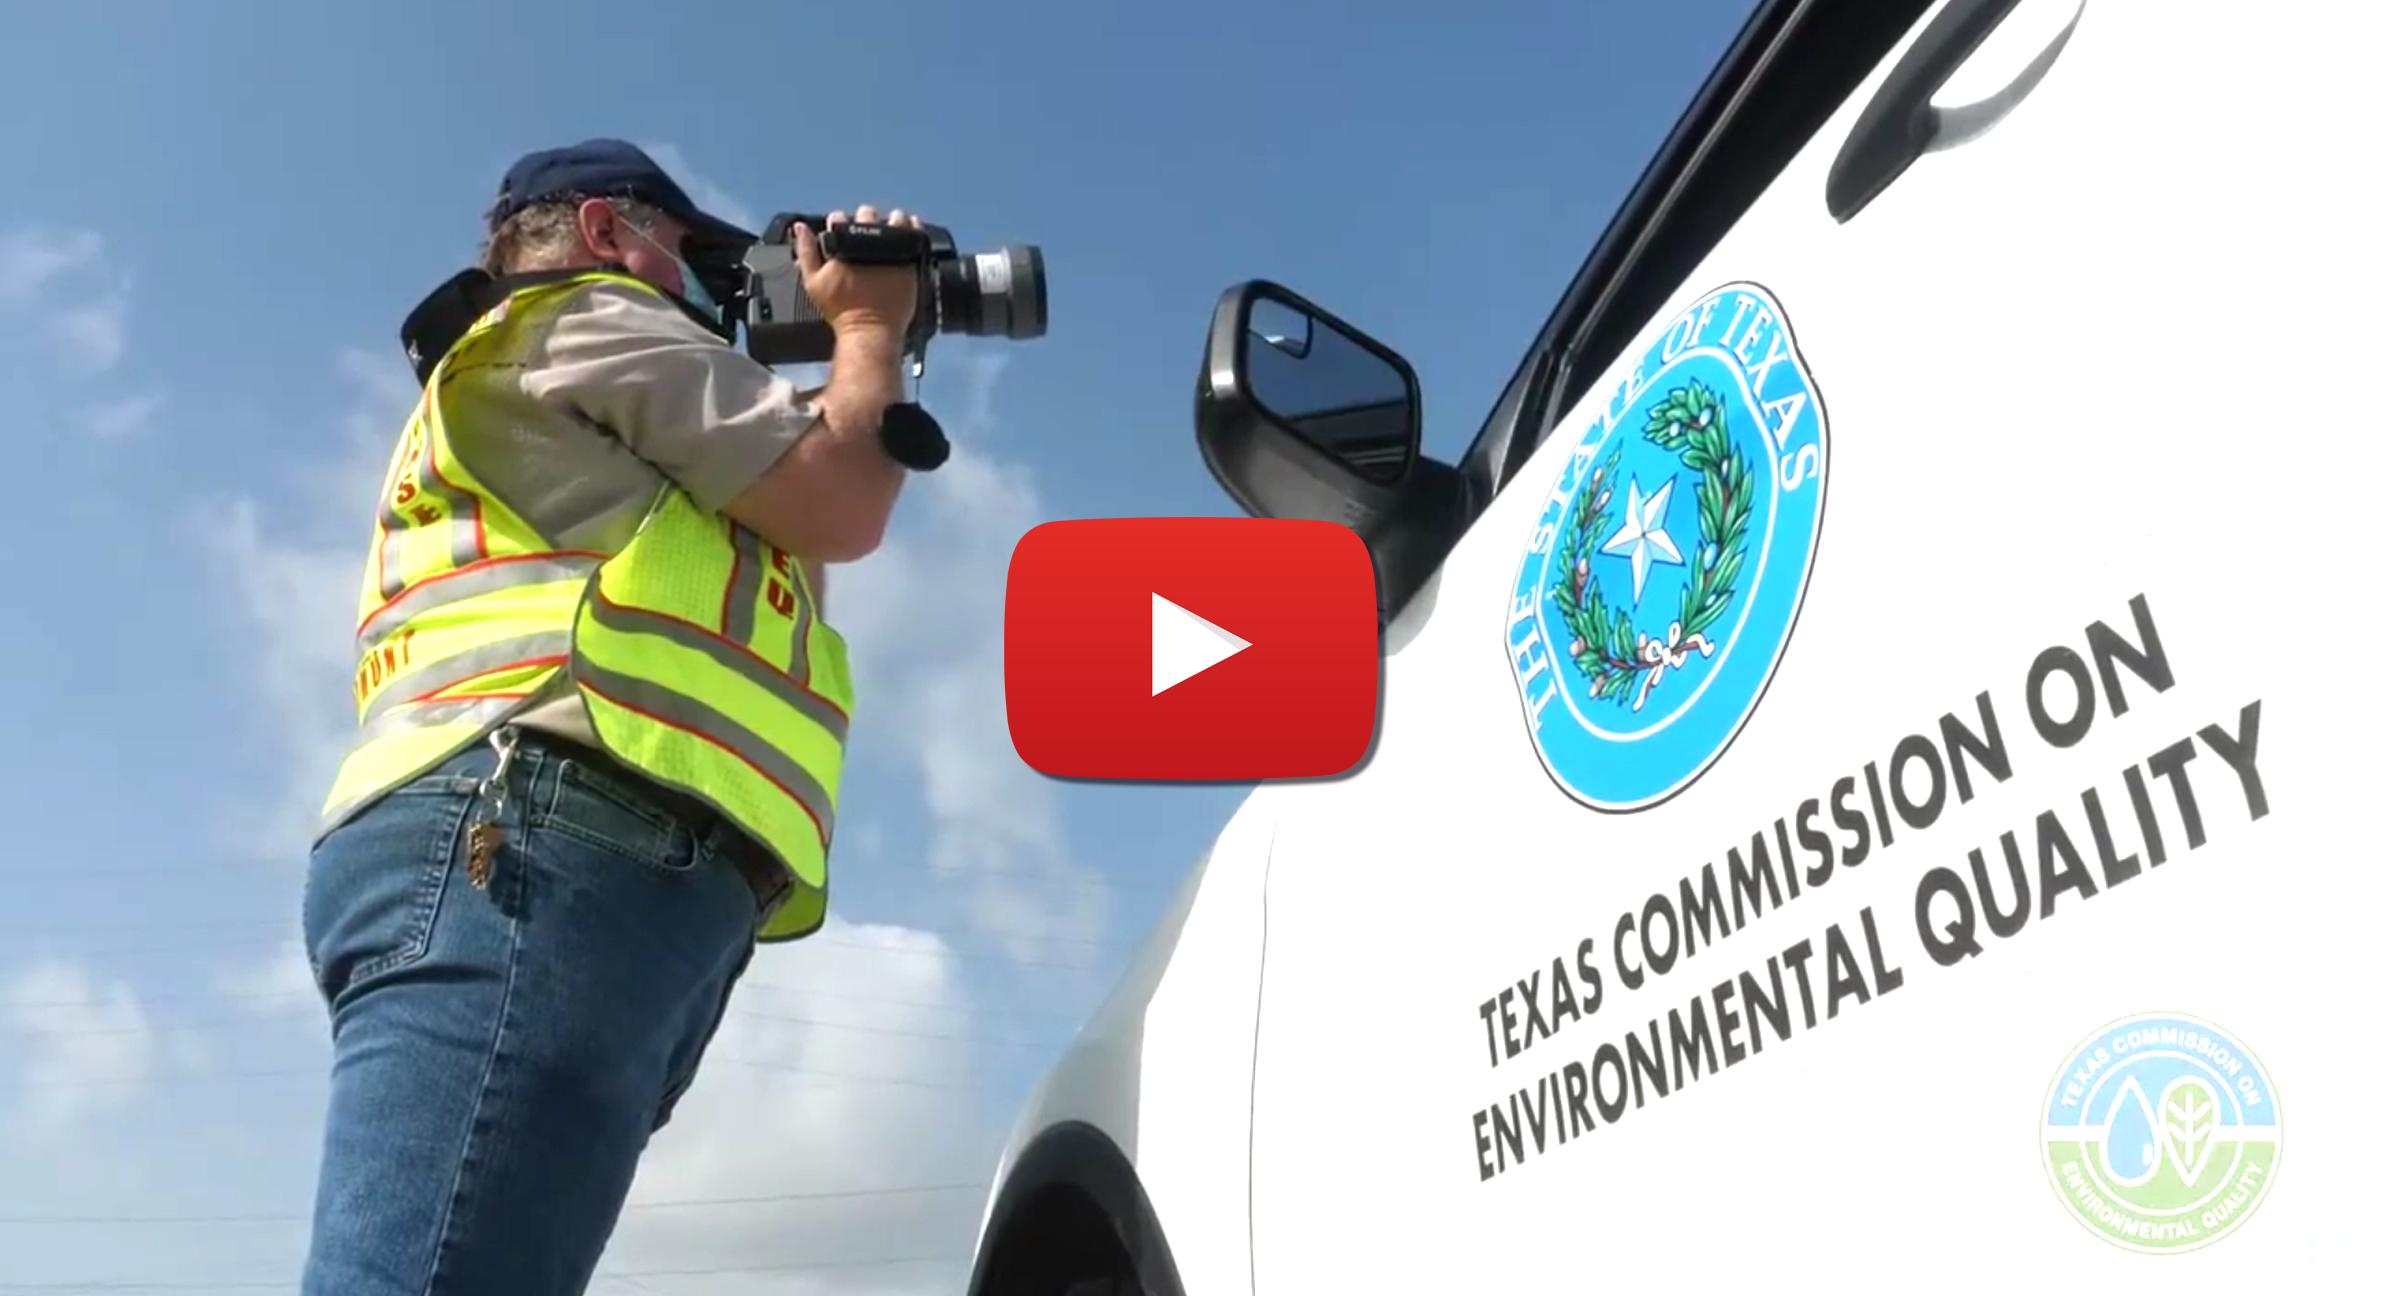 A TCEQ employee filming near a TCEQ vehicle